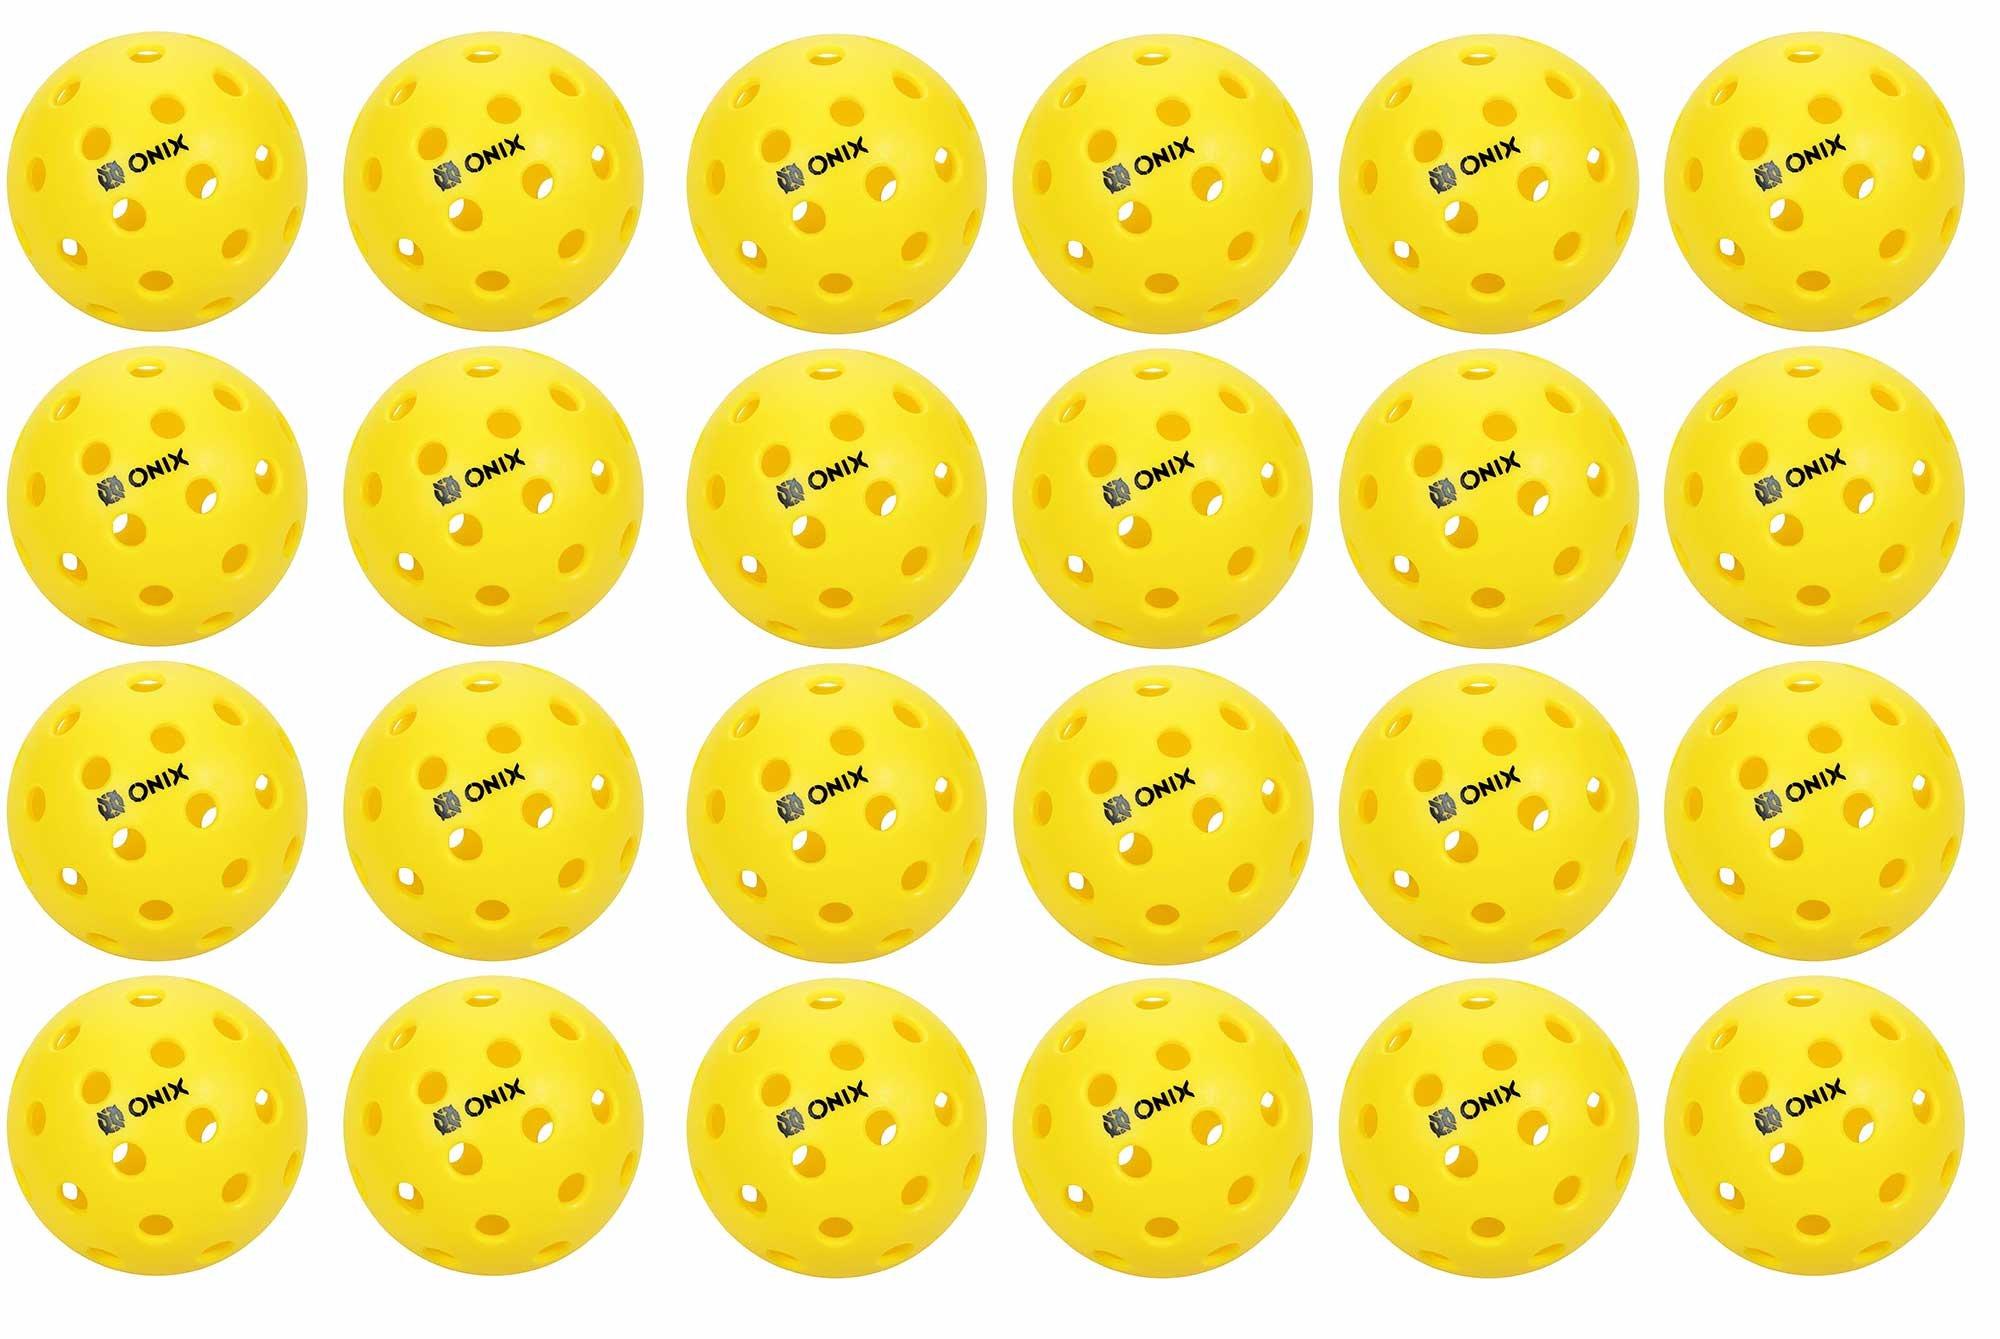 Onix Pure 2 Outdoor Pickleball Balls 24 PACK YELLOW